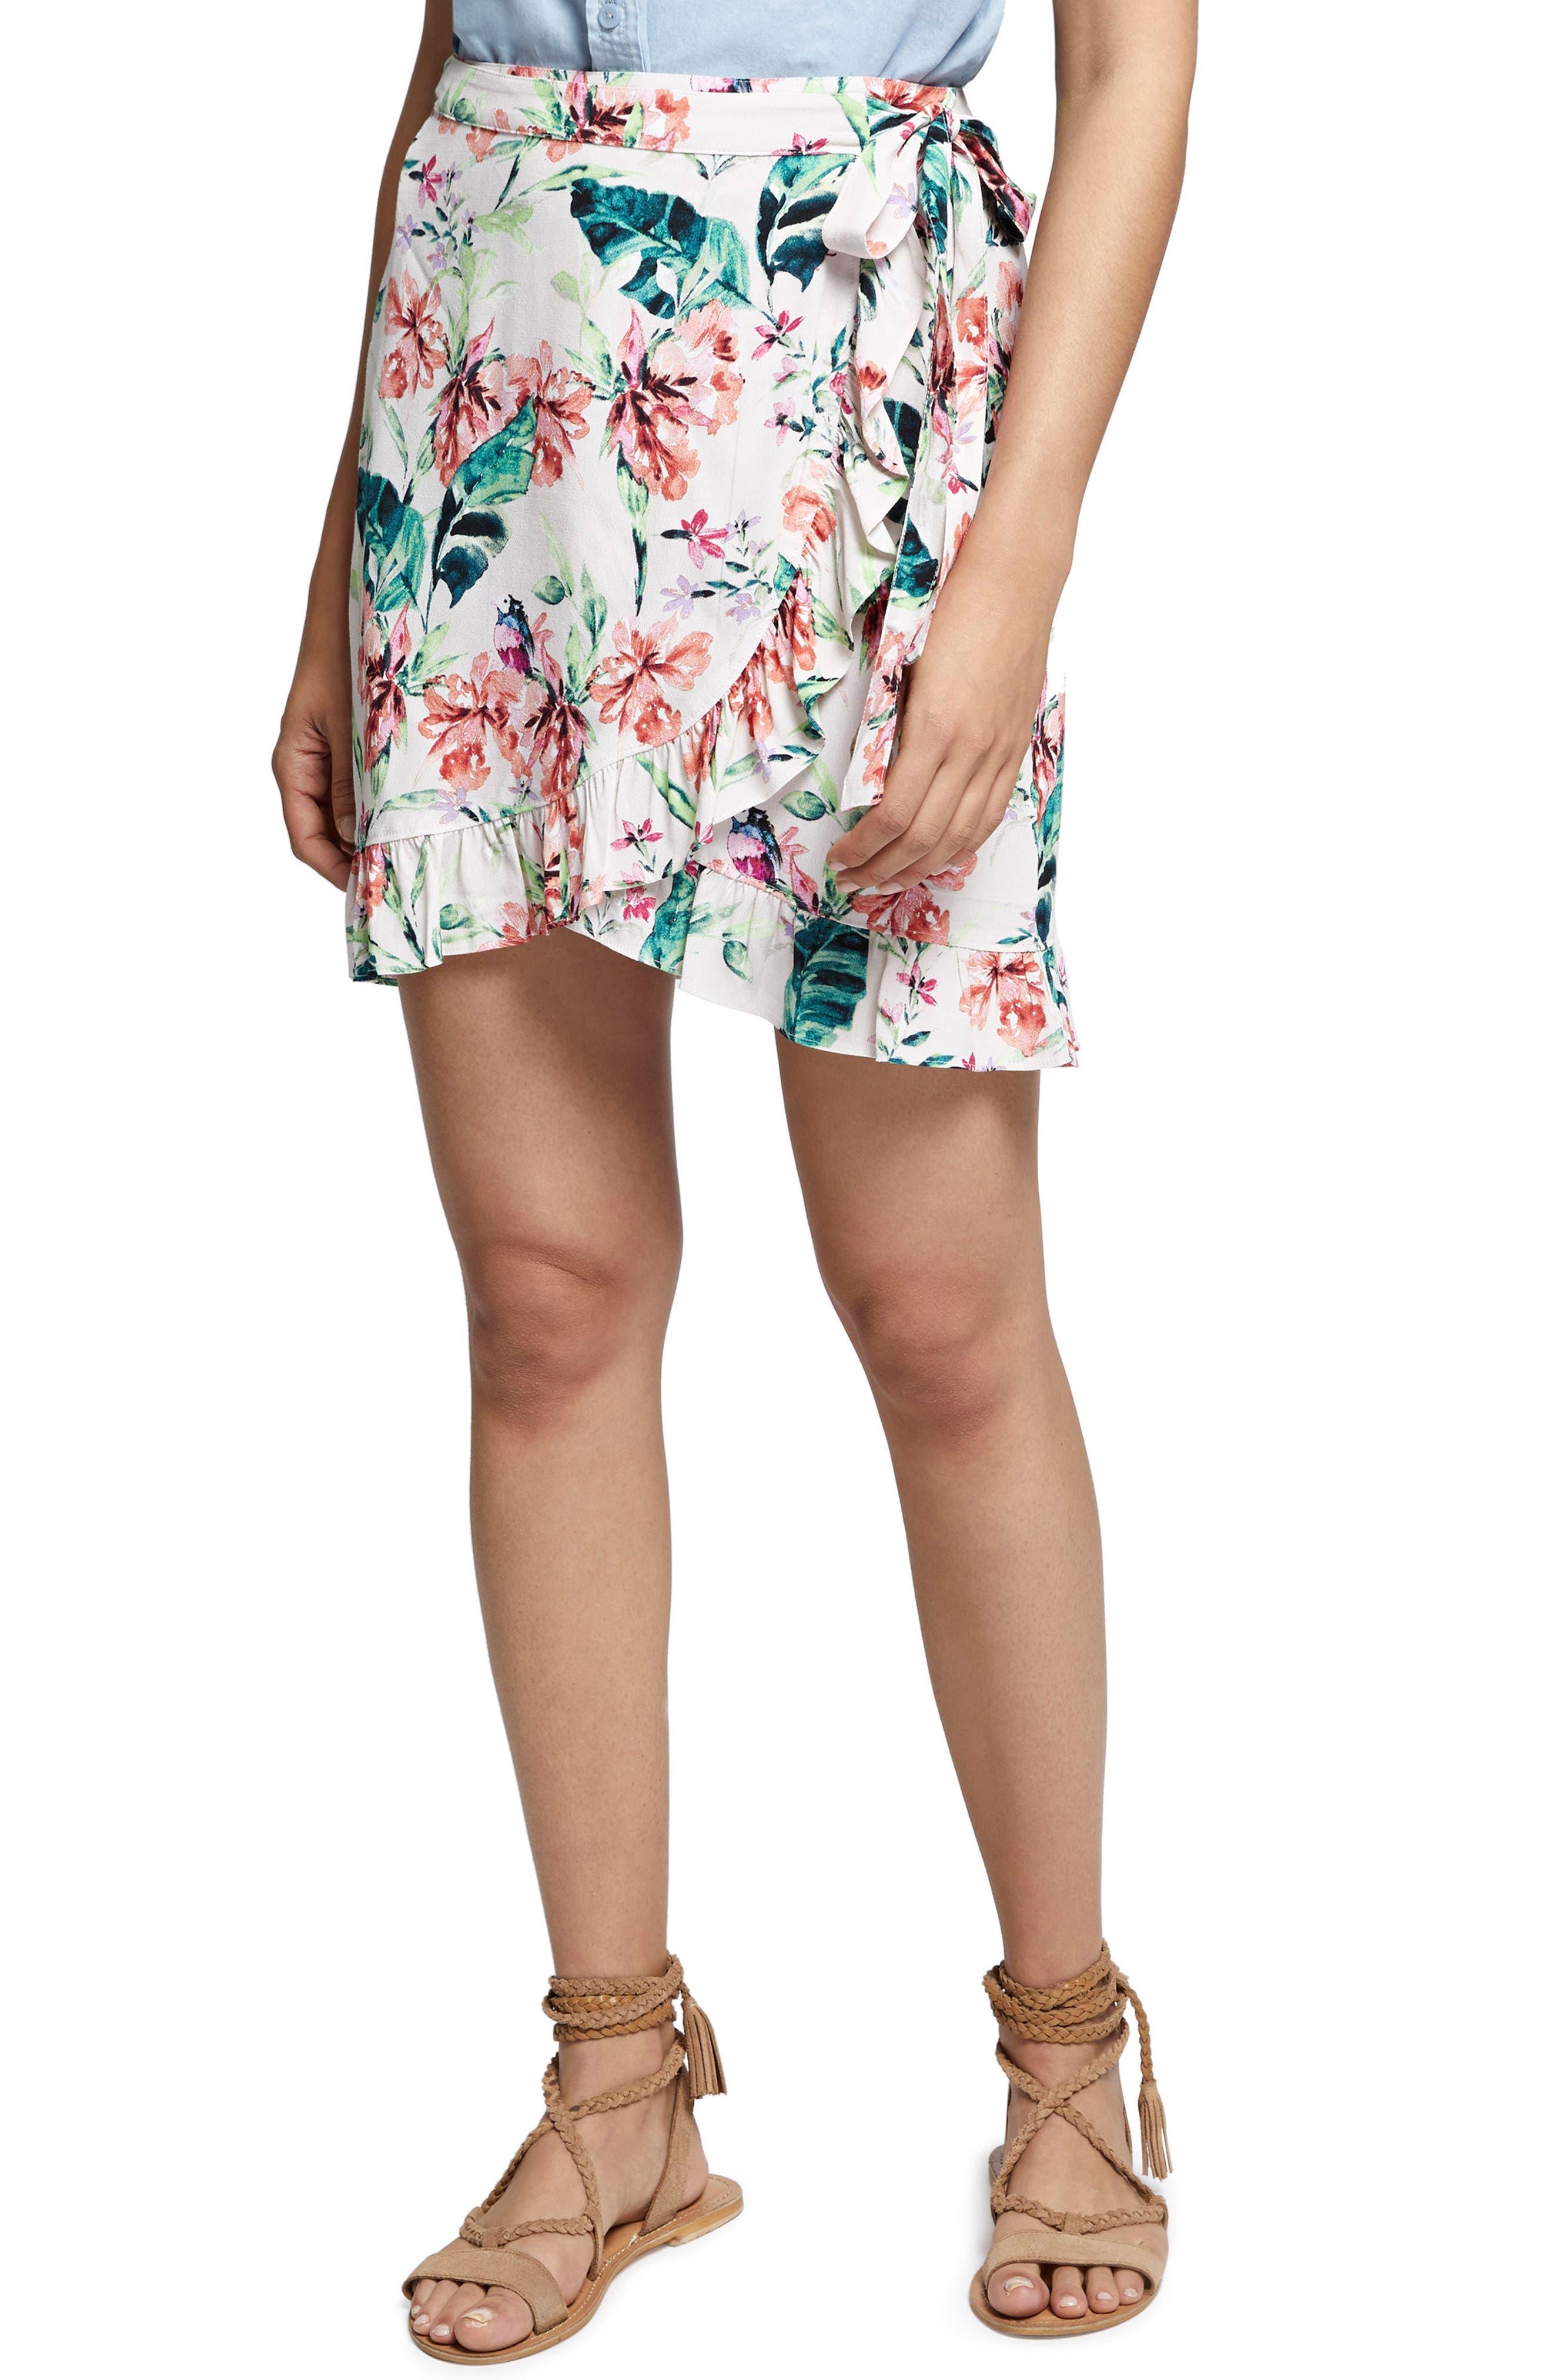 Sanctuary Tropicana Side Tie Ruffle Skirt